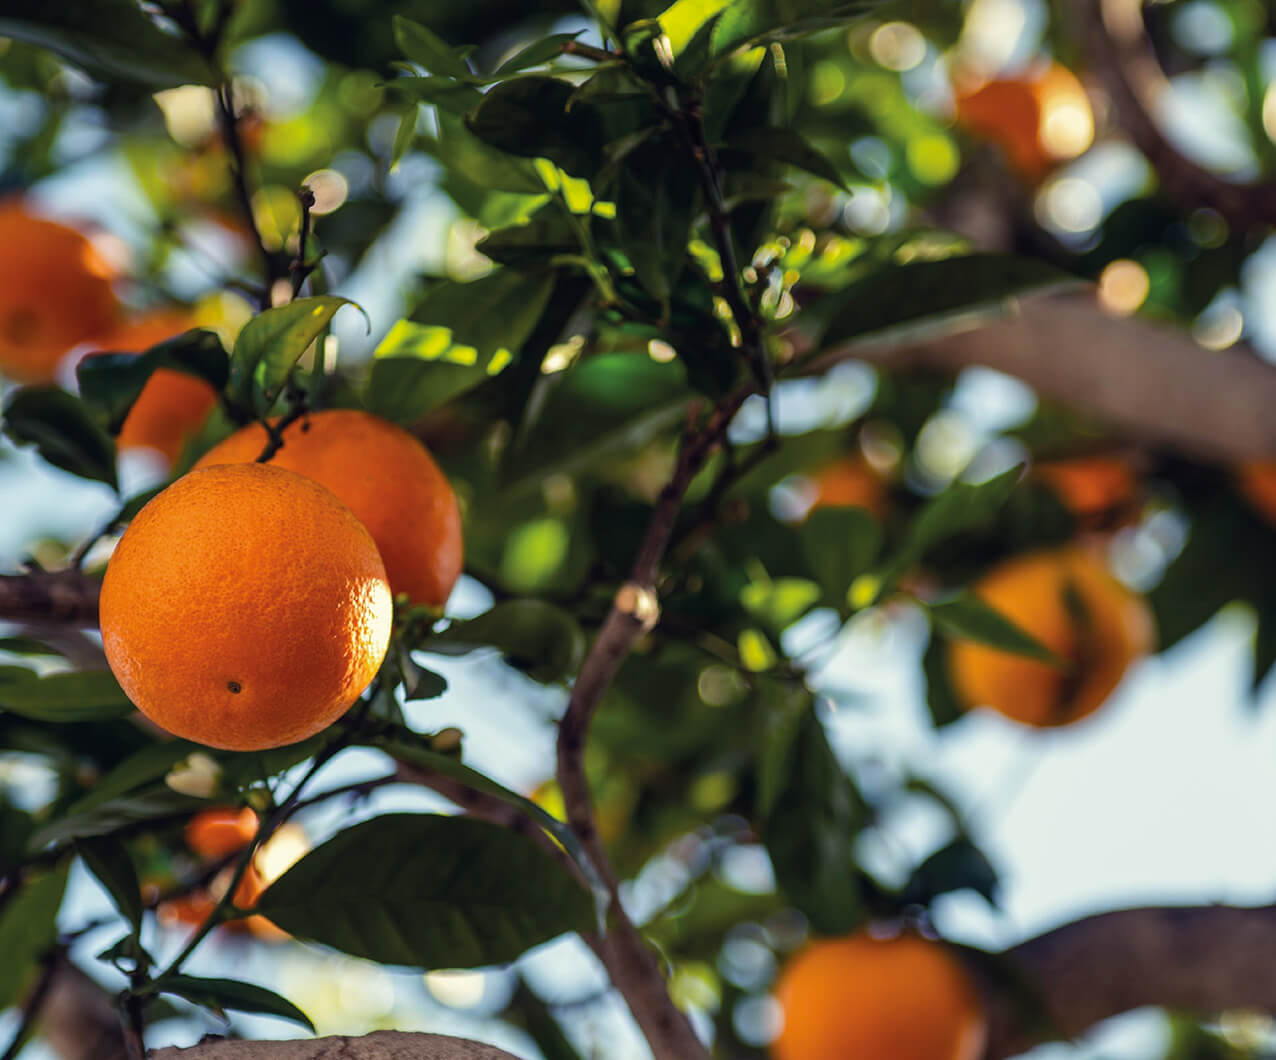 Image of an orange tree in the Spanish sunshine